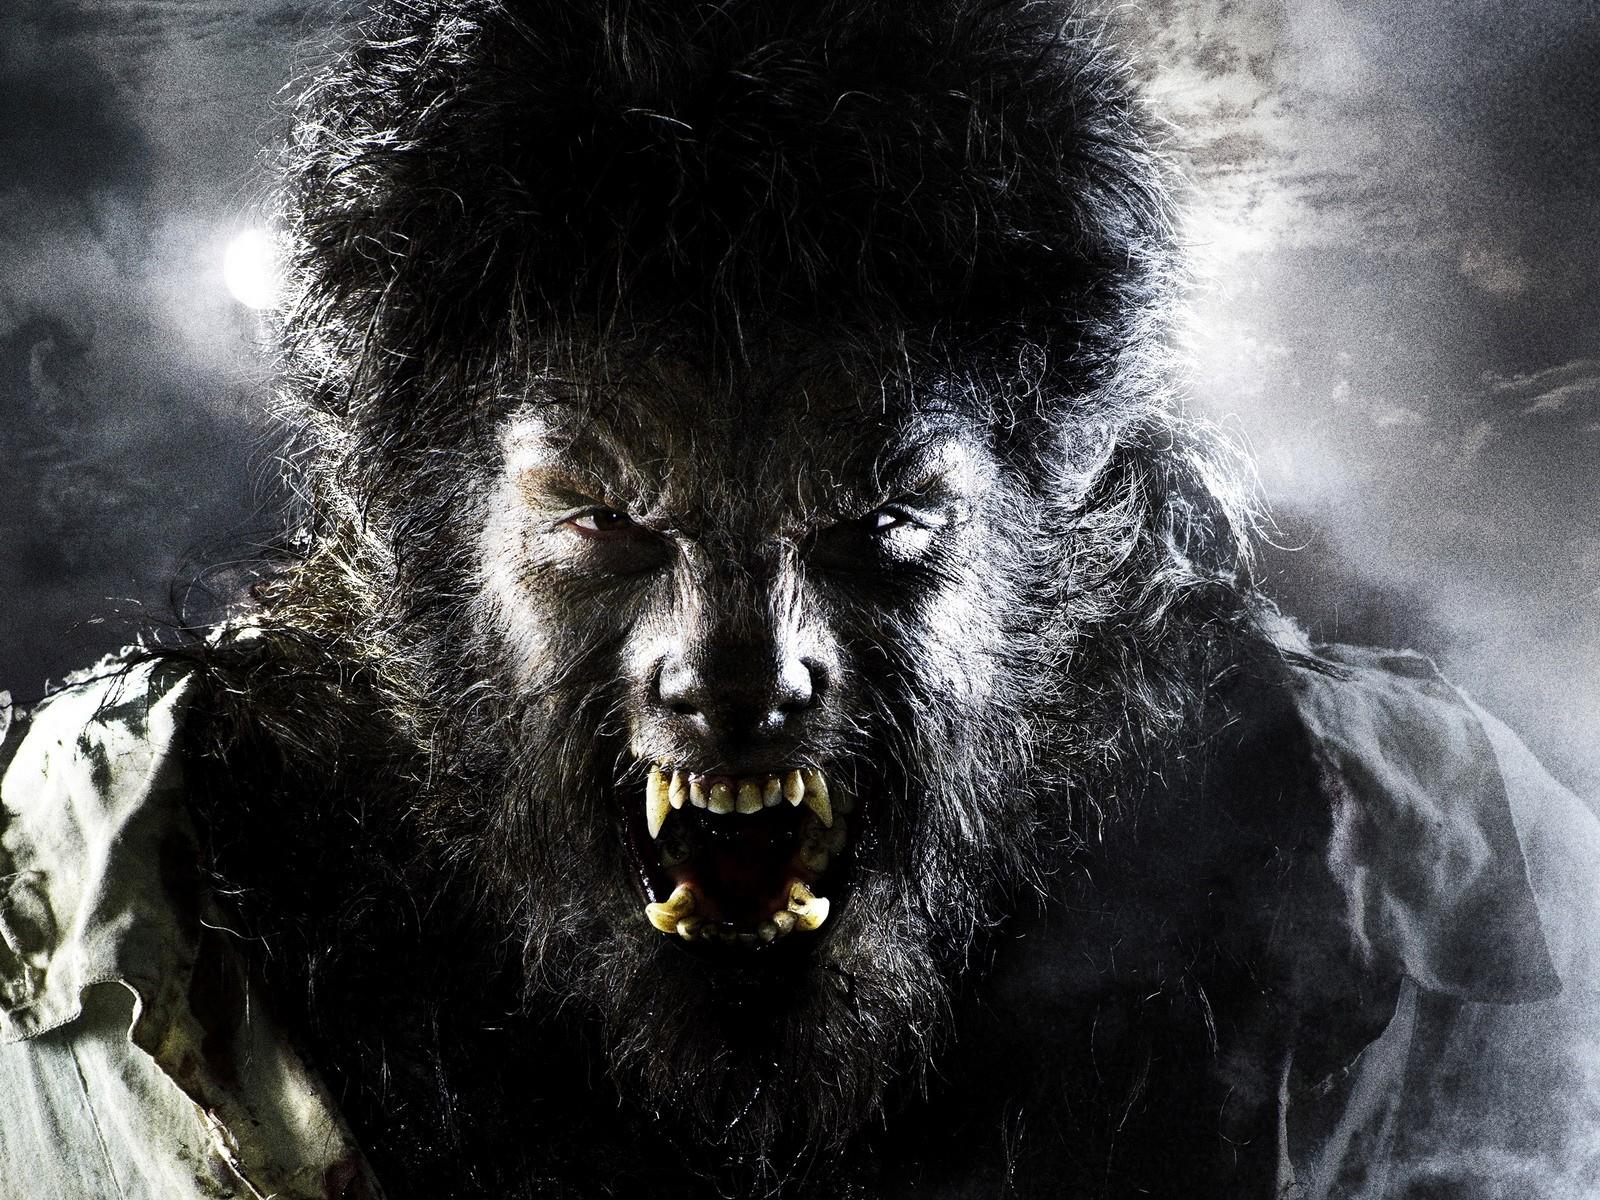 152 Werewolf HD <b>Wallpapers</b> | <b>Backgrounds</b> - <b>Wallpaper</b> Abyss